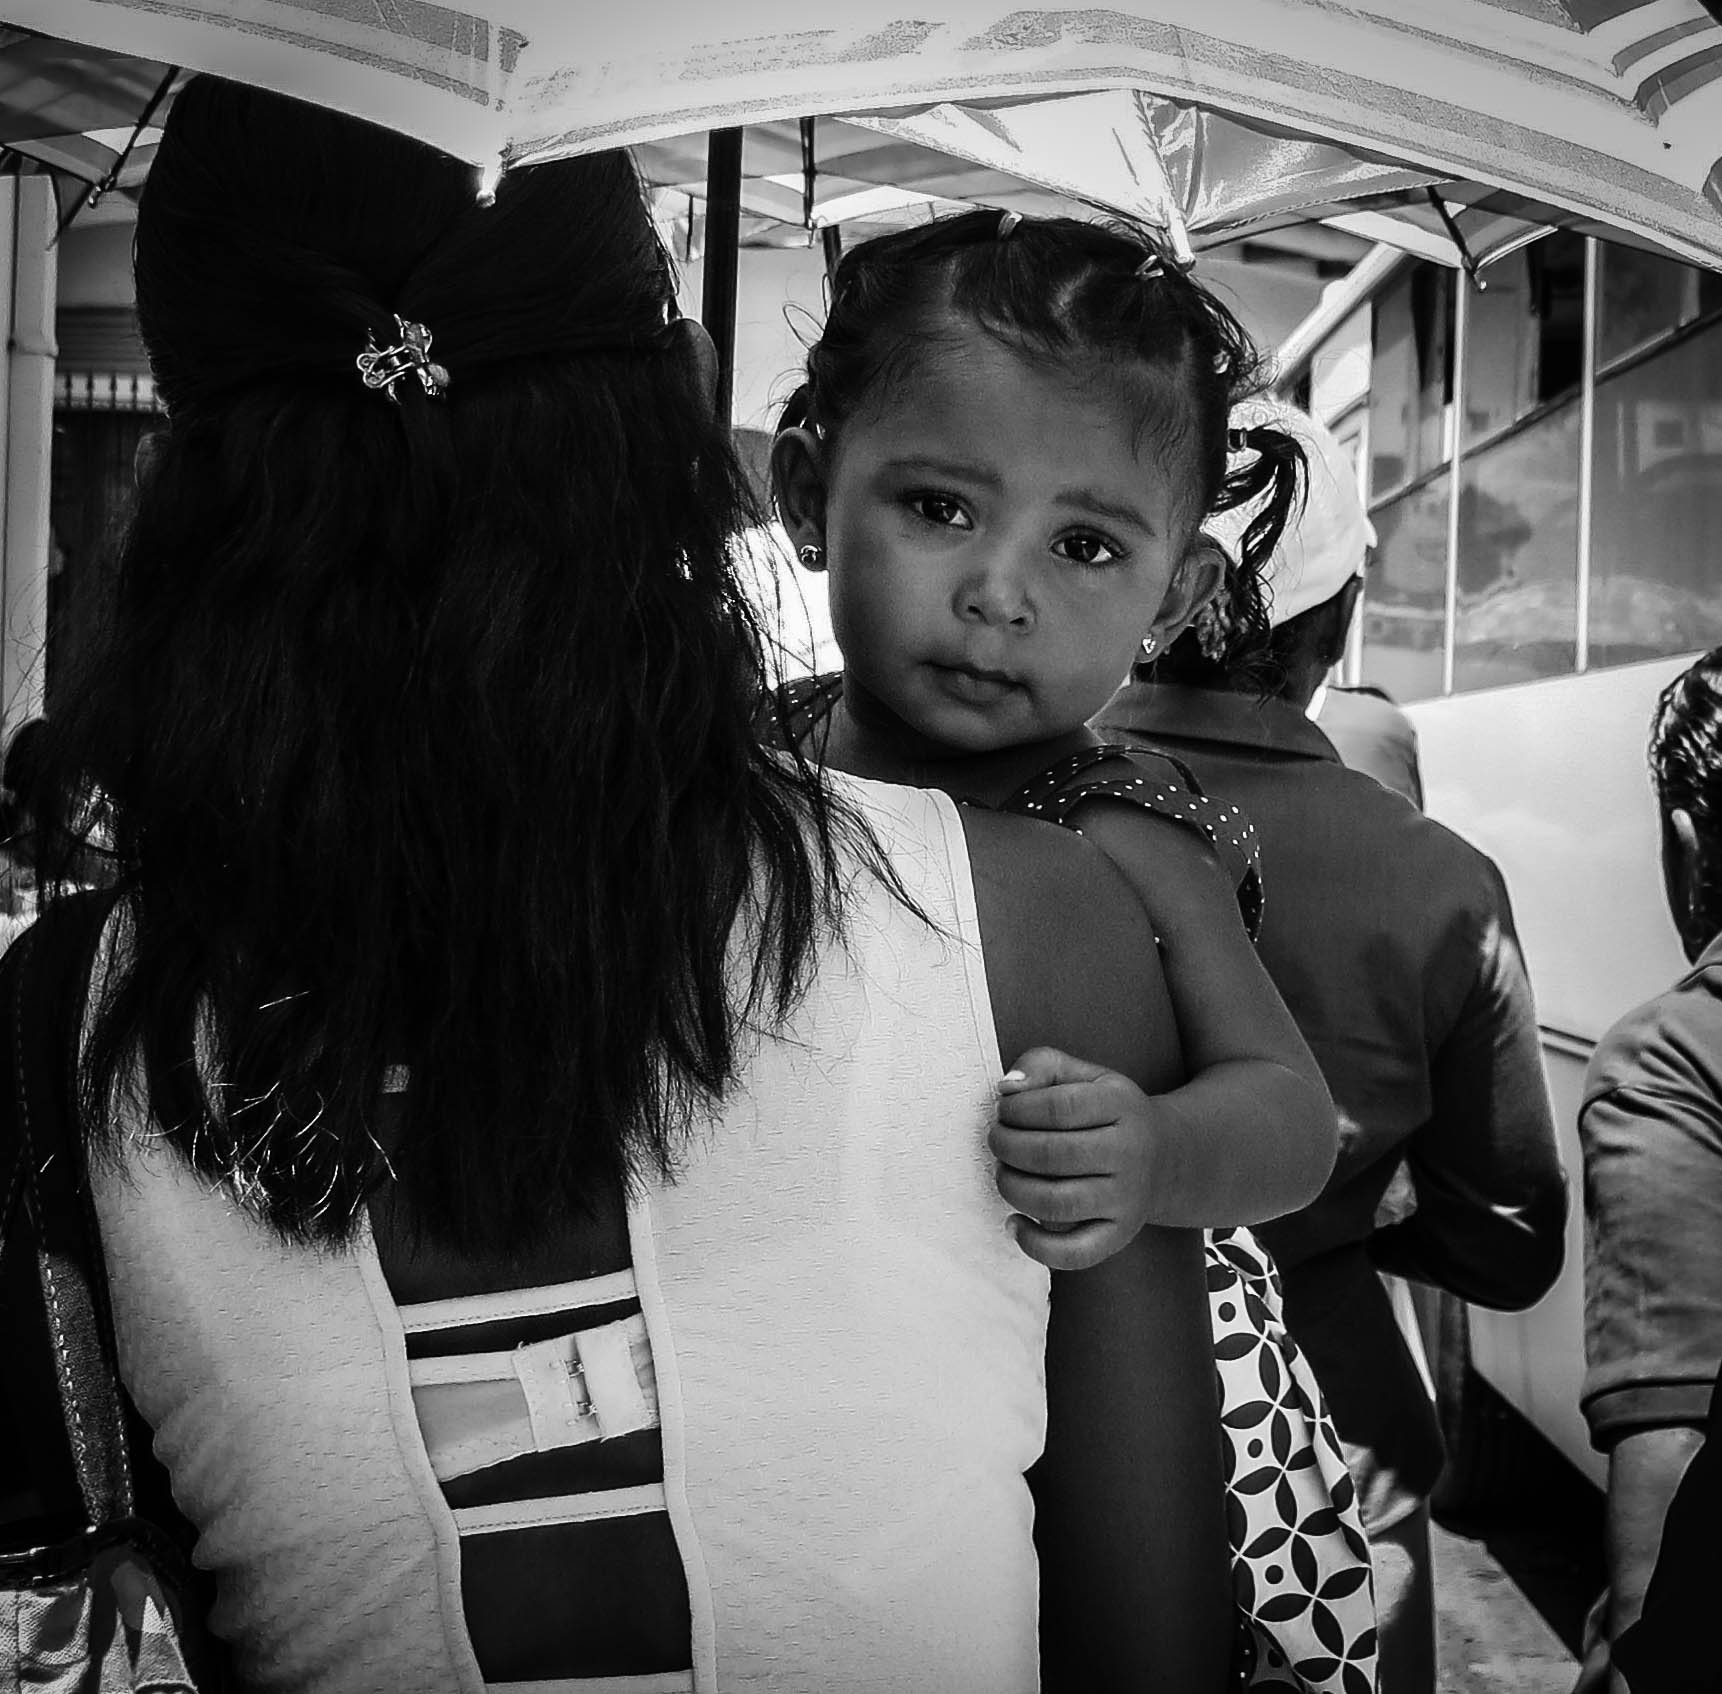 toddler-mum-carrying-leon-nicaragua